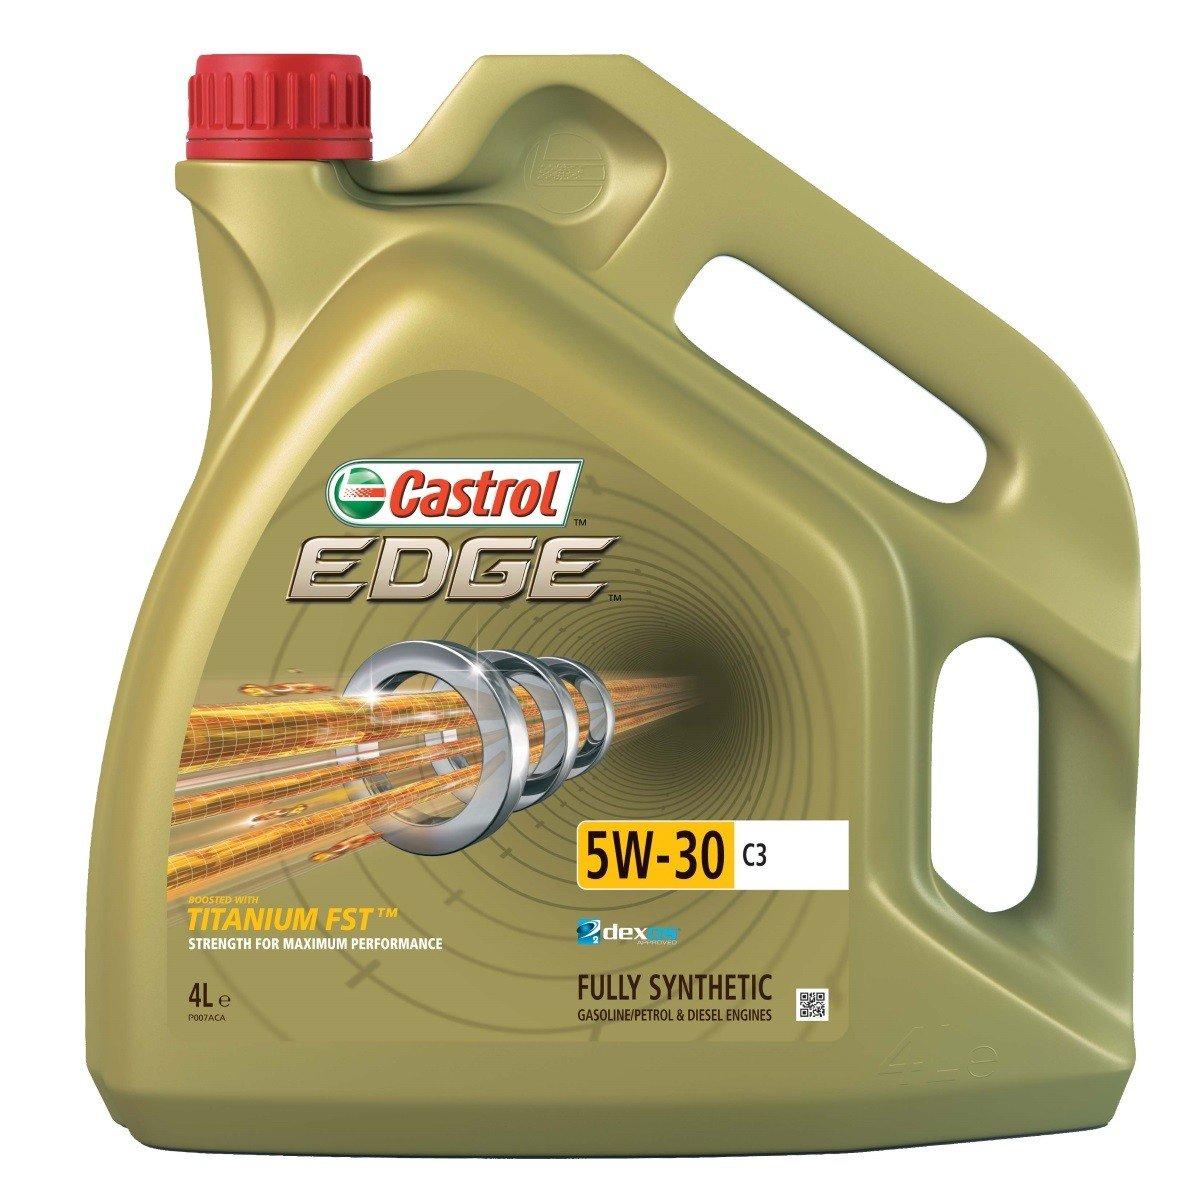 Plně syntetický motorový olej CASTROL Edge 5W30 C3 Titanium FST 4L